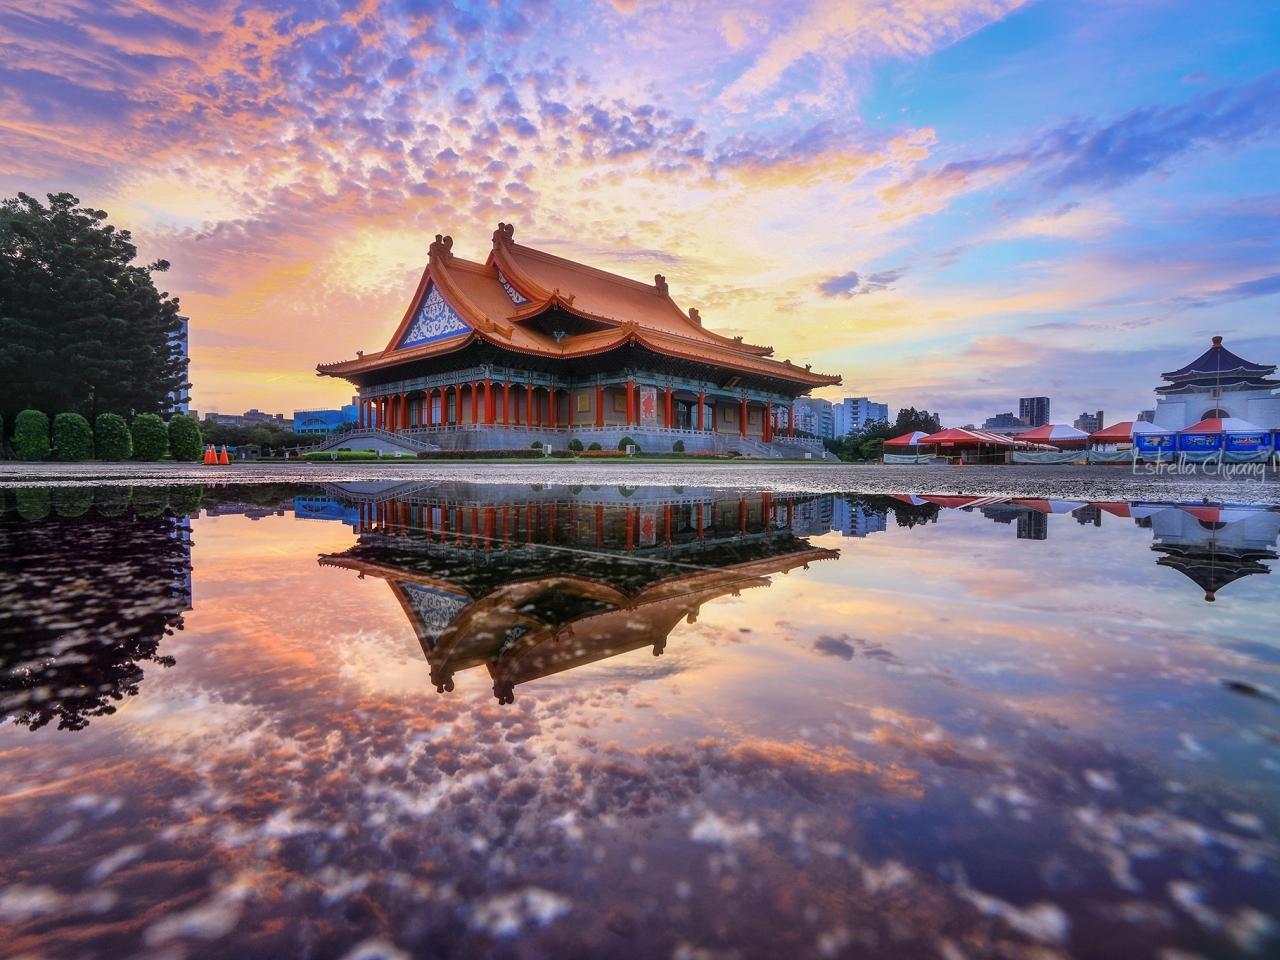 Casas en china - 1280x960